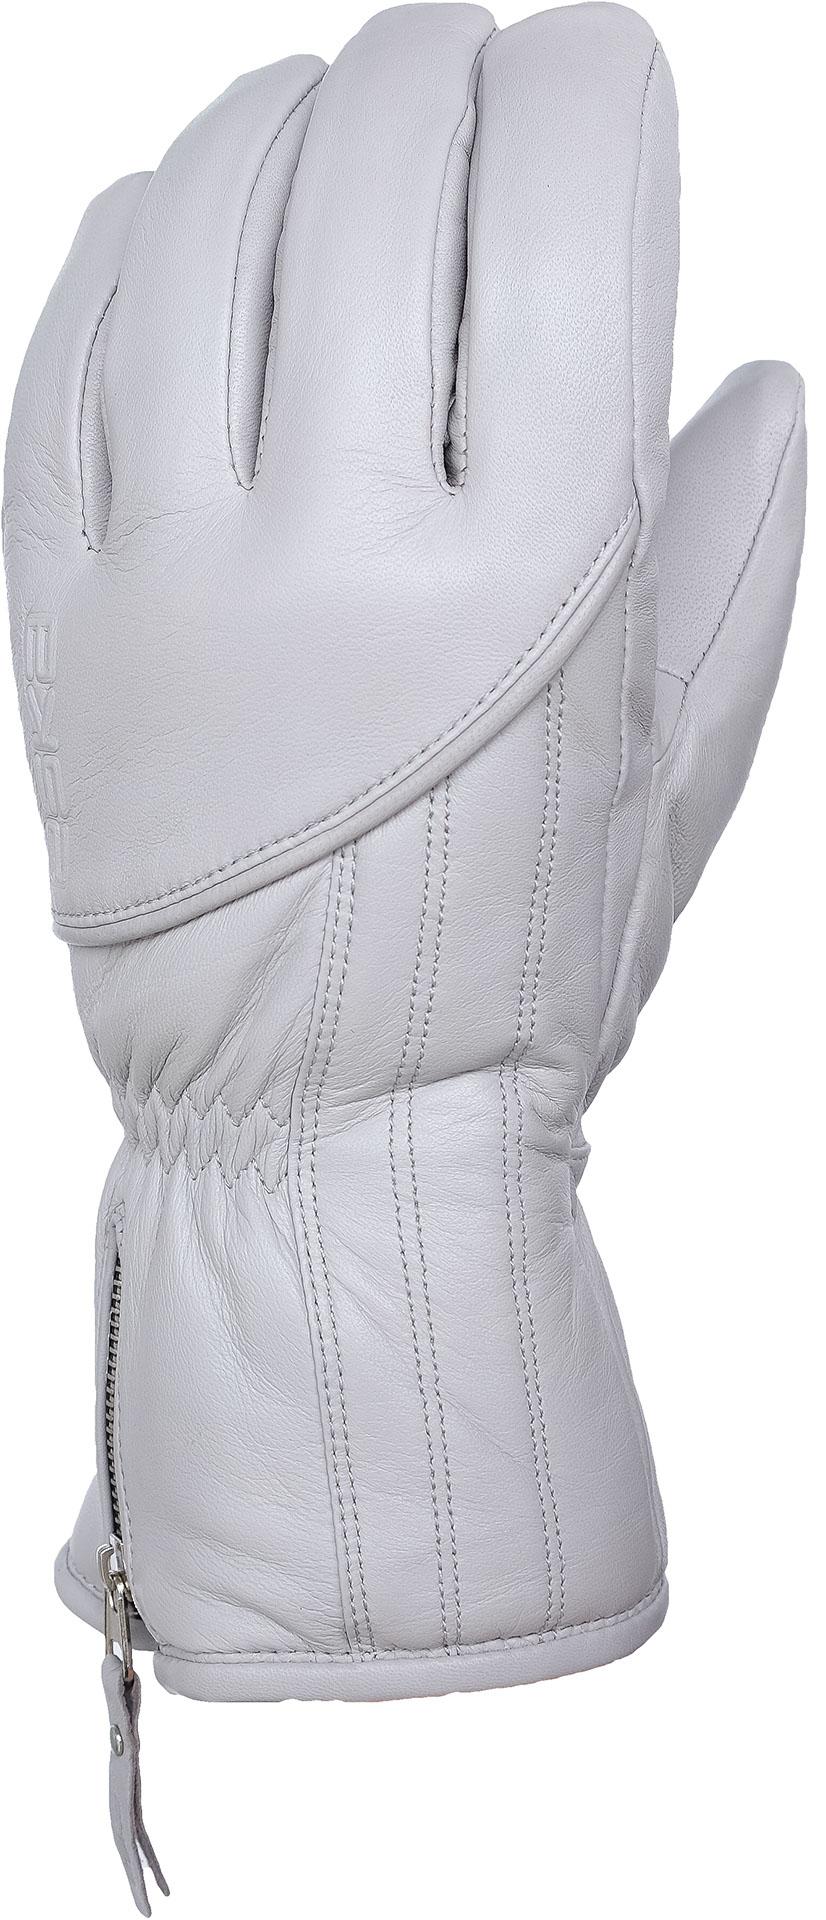 Pm Gloves Brand New ALL white Past Master Cotton Gloves Past Master Glove